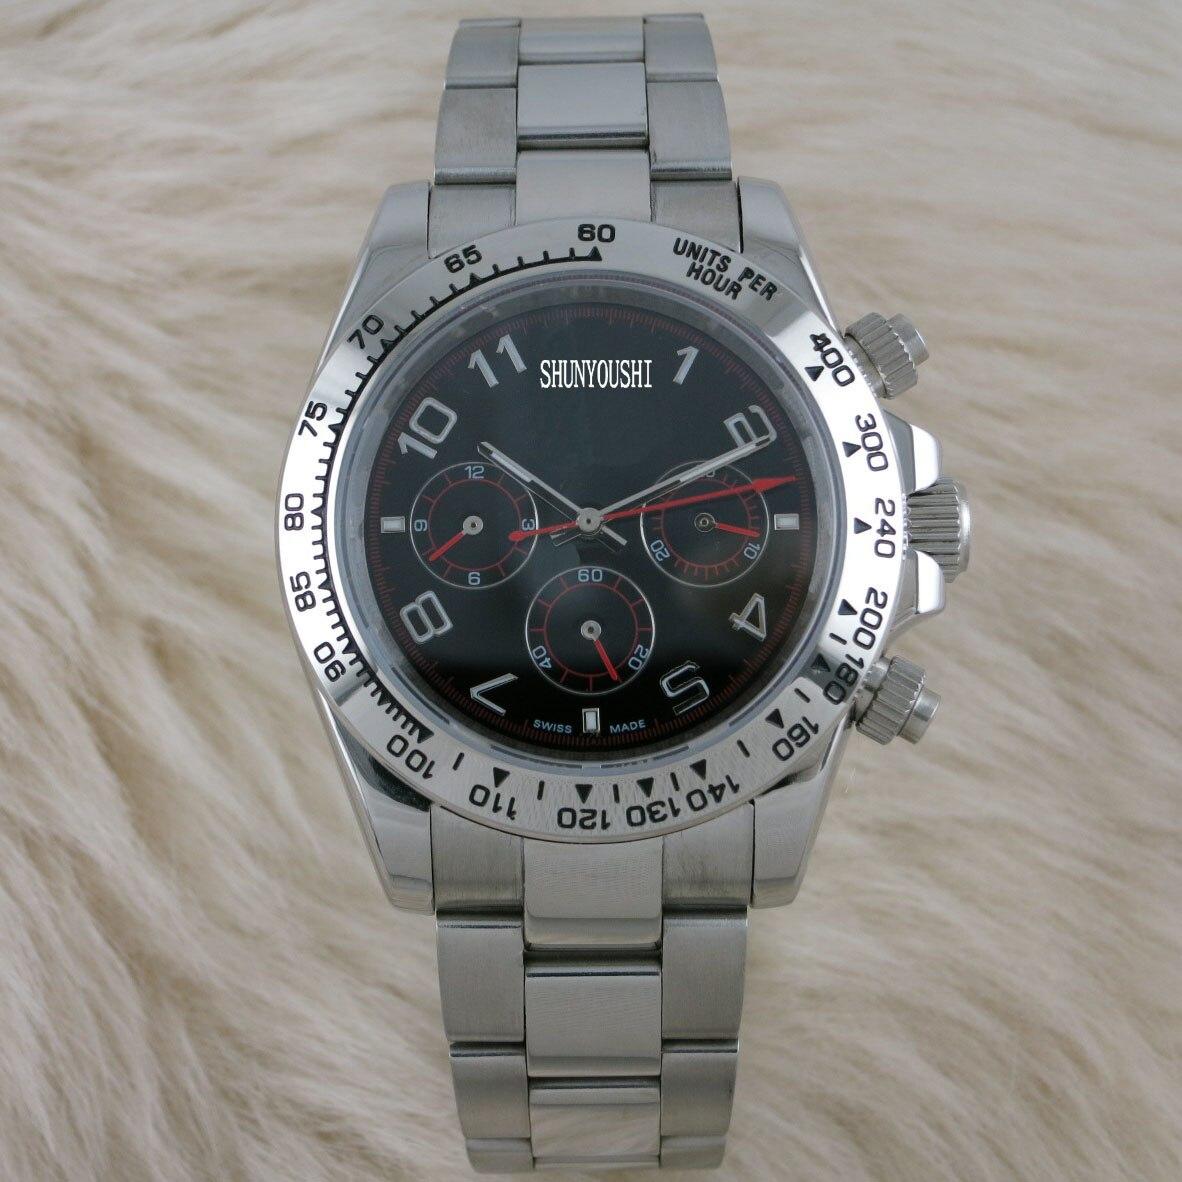 WG05430        Mens Watches Top Brand Runway Luxury European Design Automatic Mechanical WatchWG05430        Mens Watches Top Brand Runway Luxury European Design Automatic Mechanical Watch